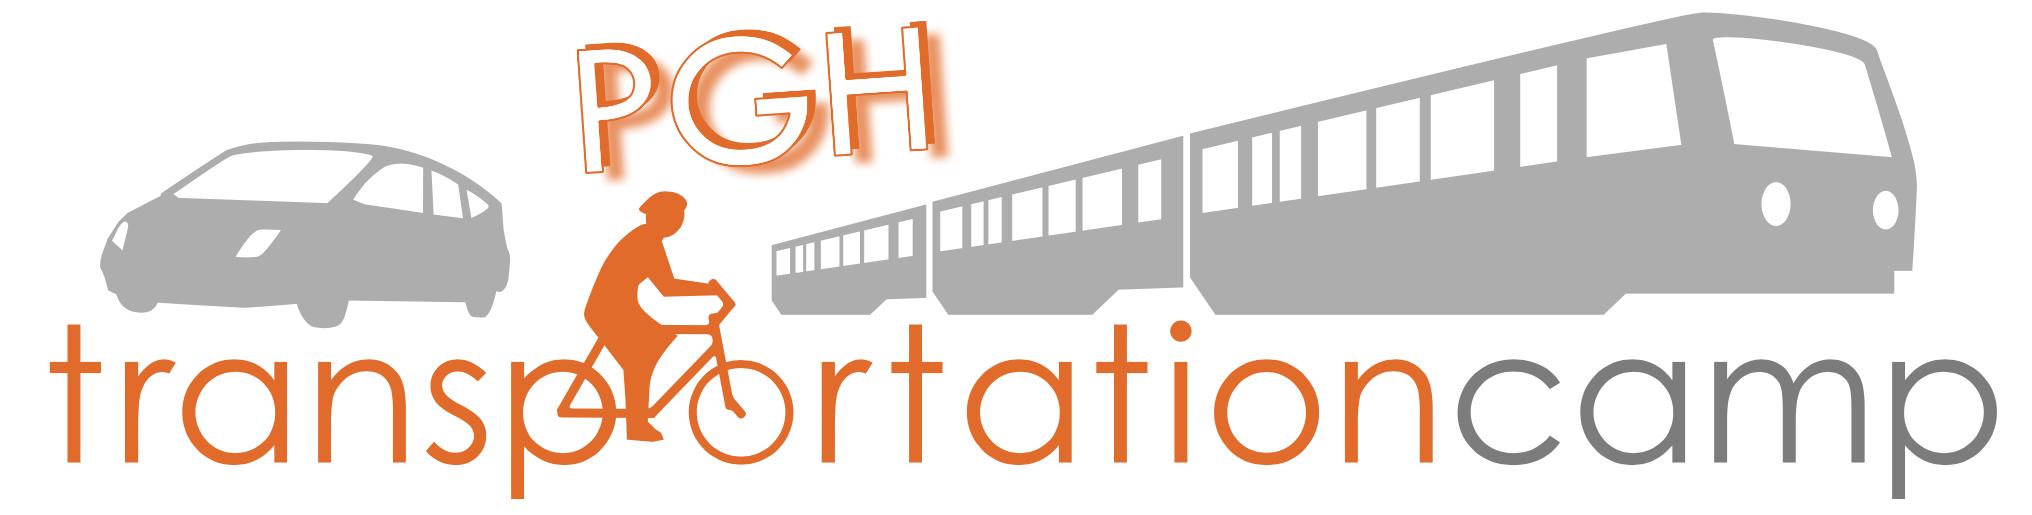 Transportation Camp PGH Logo